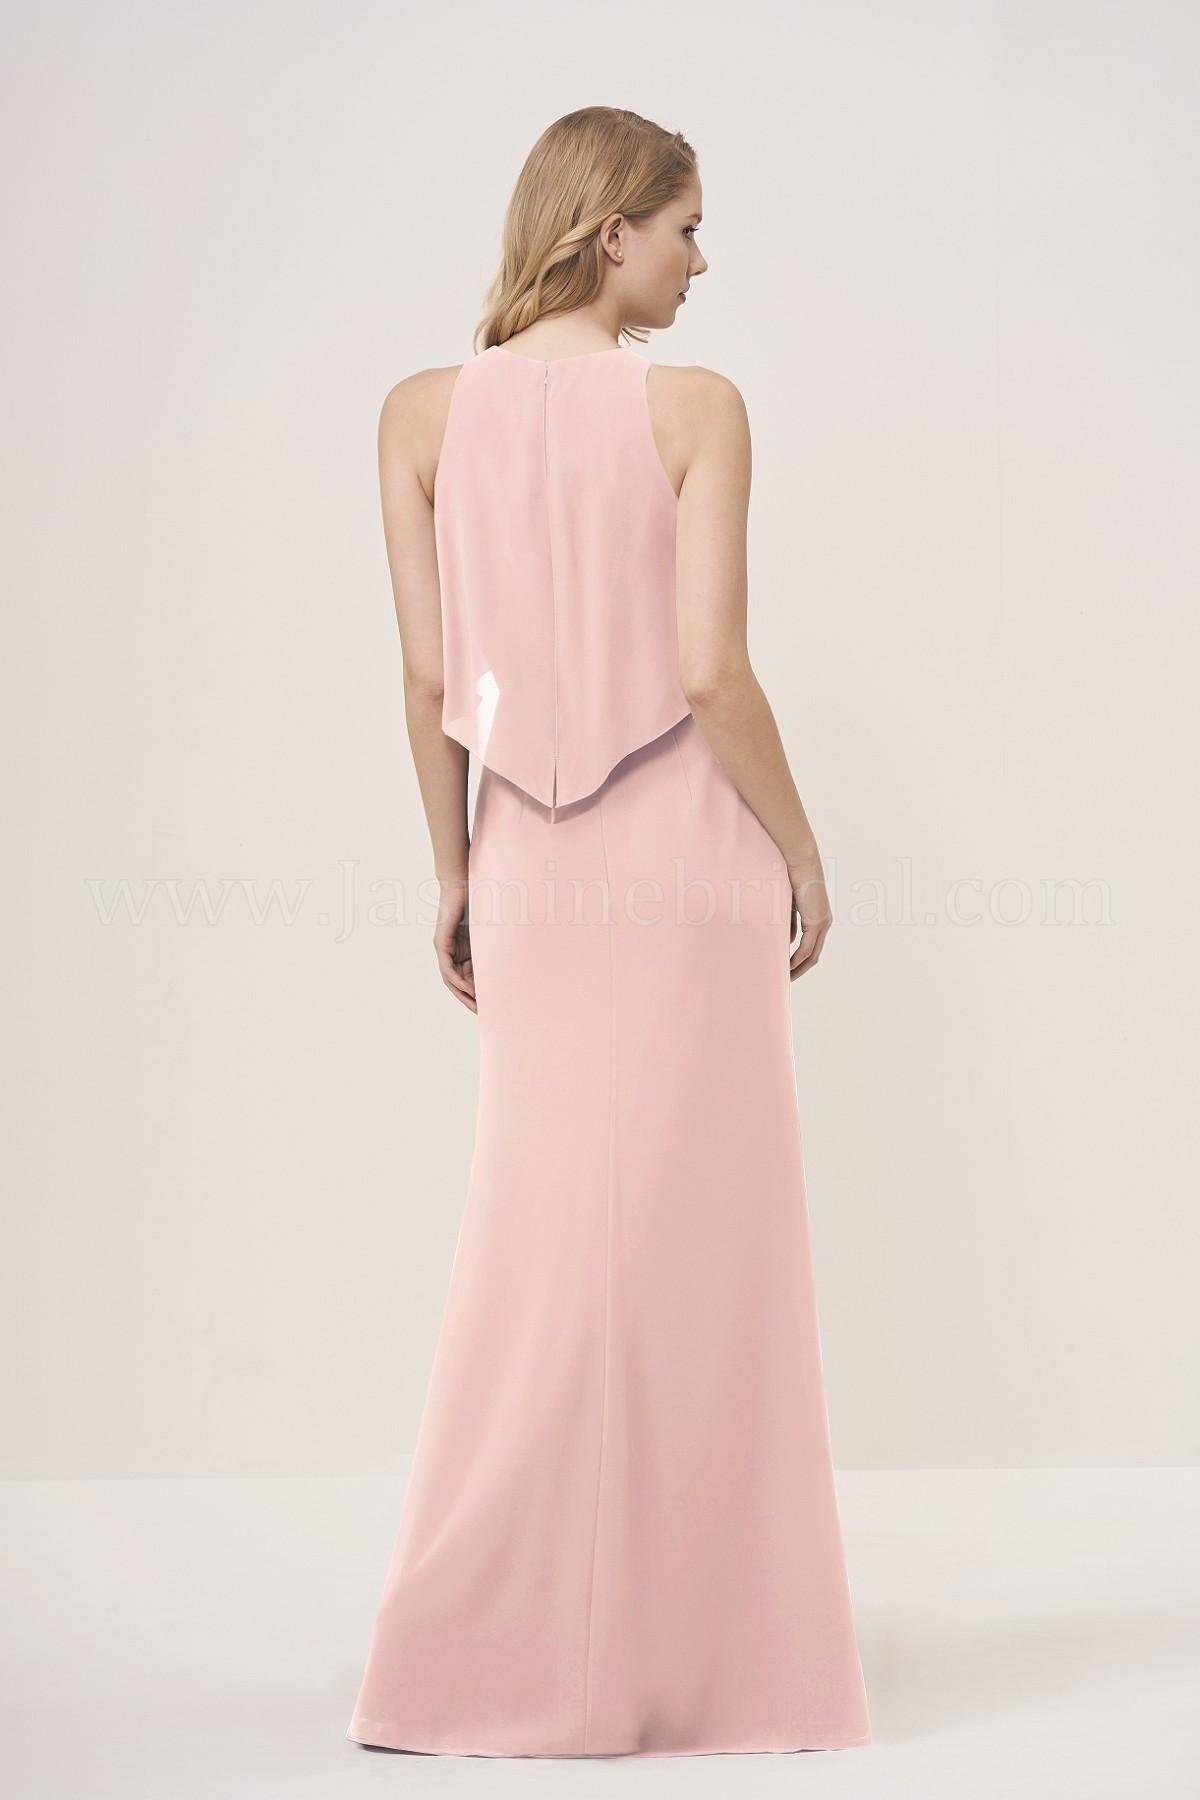 bridesmaid-dresses-P196057-B